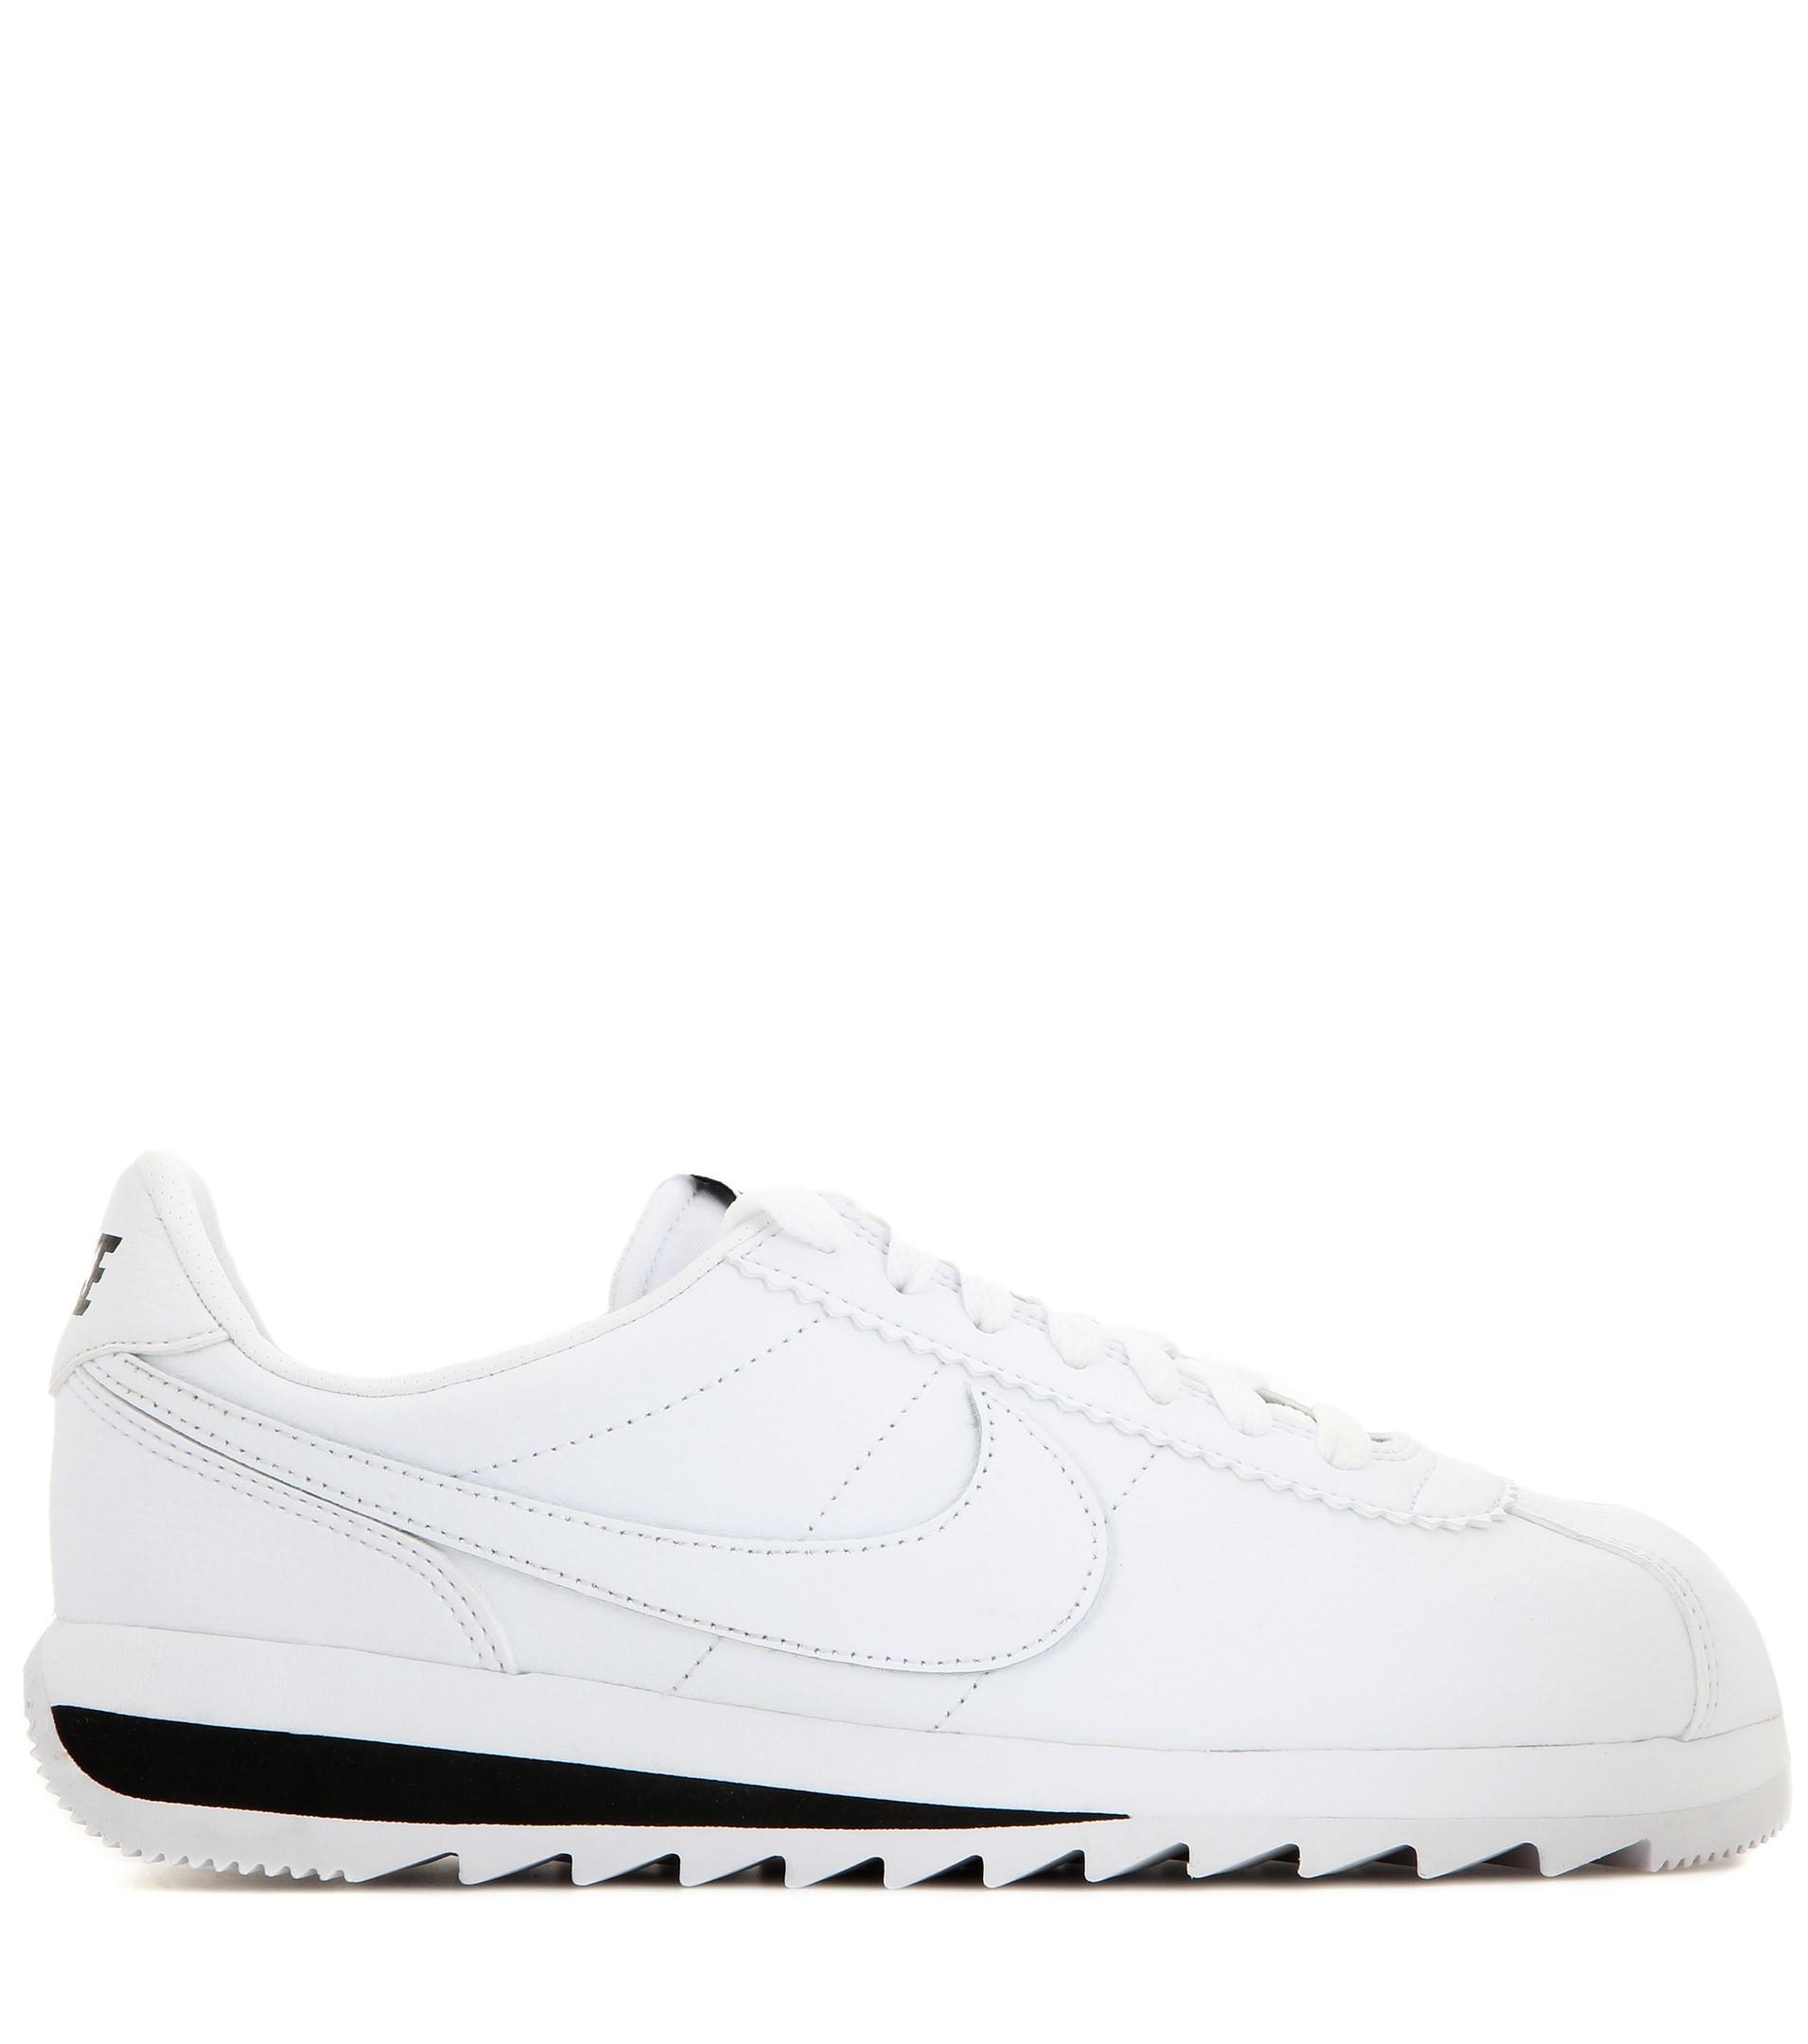 buy popular e2f9a db018 ... uk lyst nike classic cortez epic premium leather sneakers in white  8c4d8 49f1e